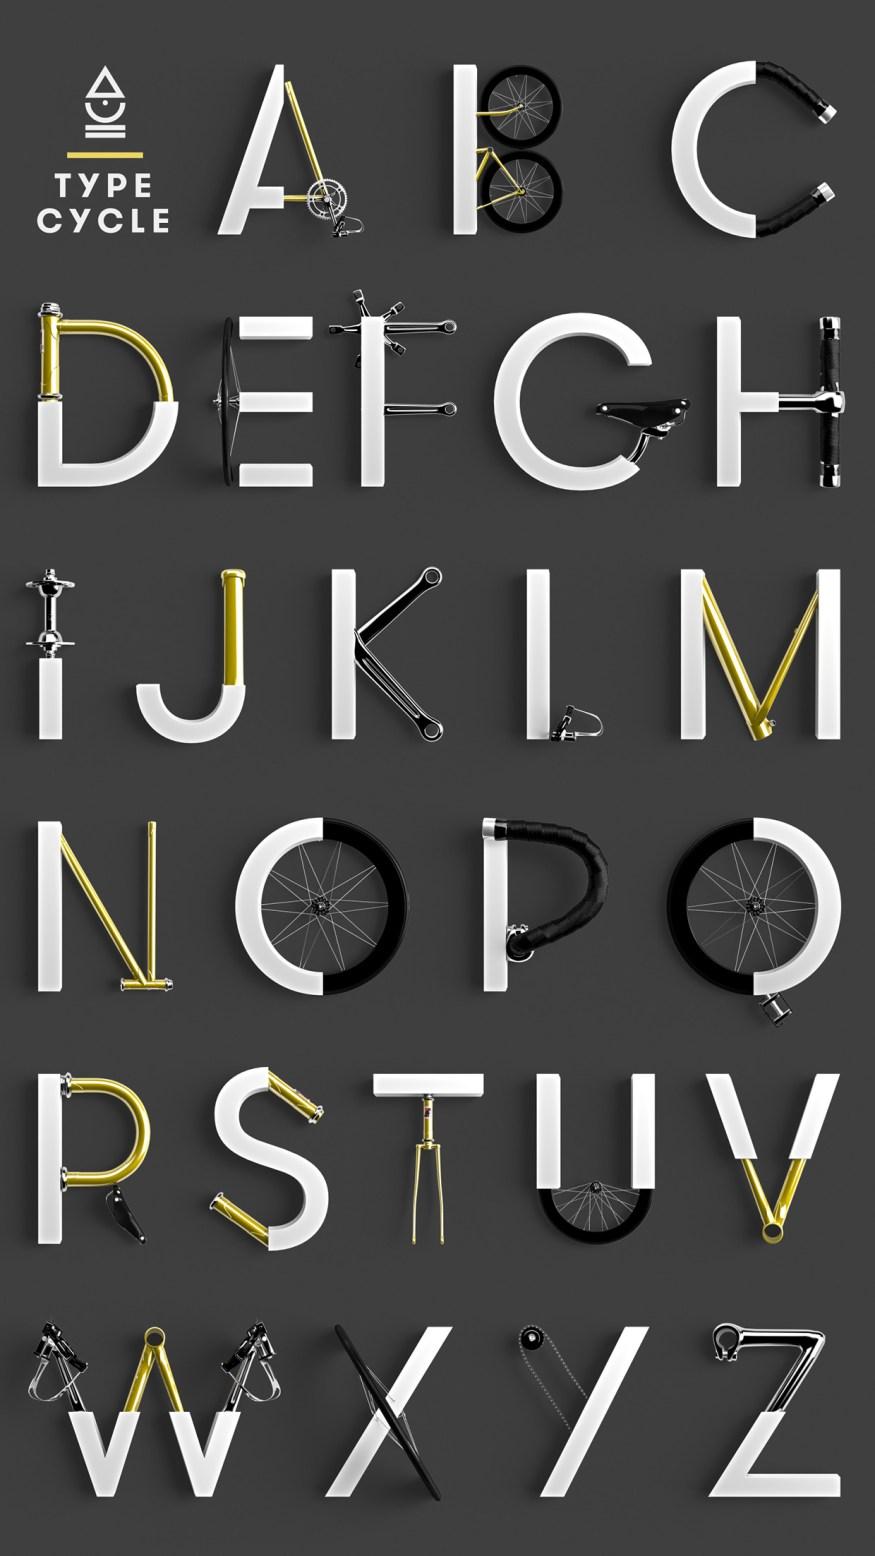 Cycle-Typeface-marcelpiekarski-poster-cotw